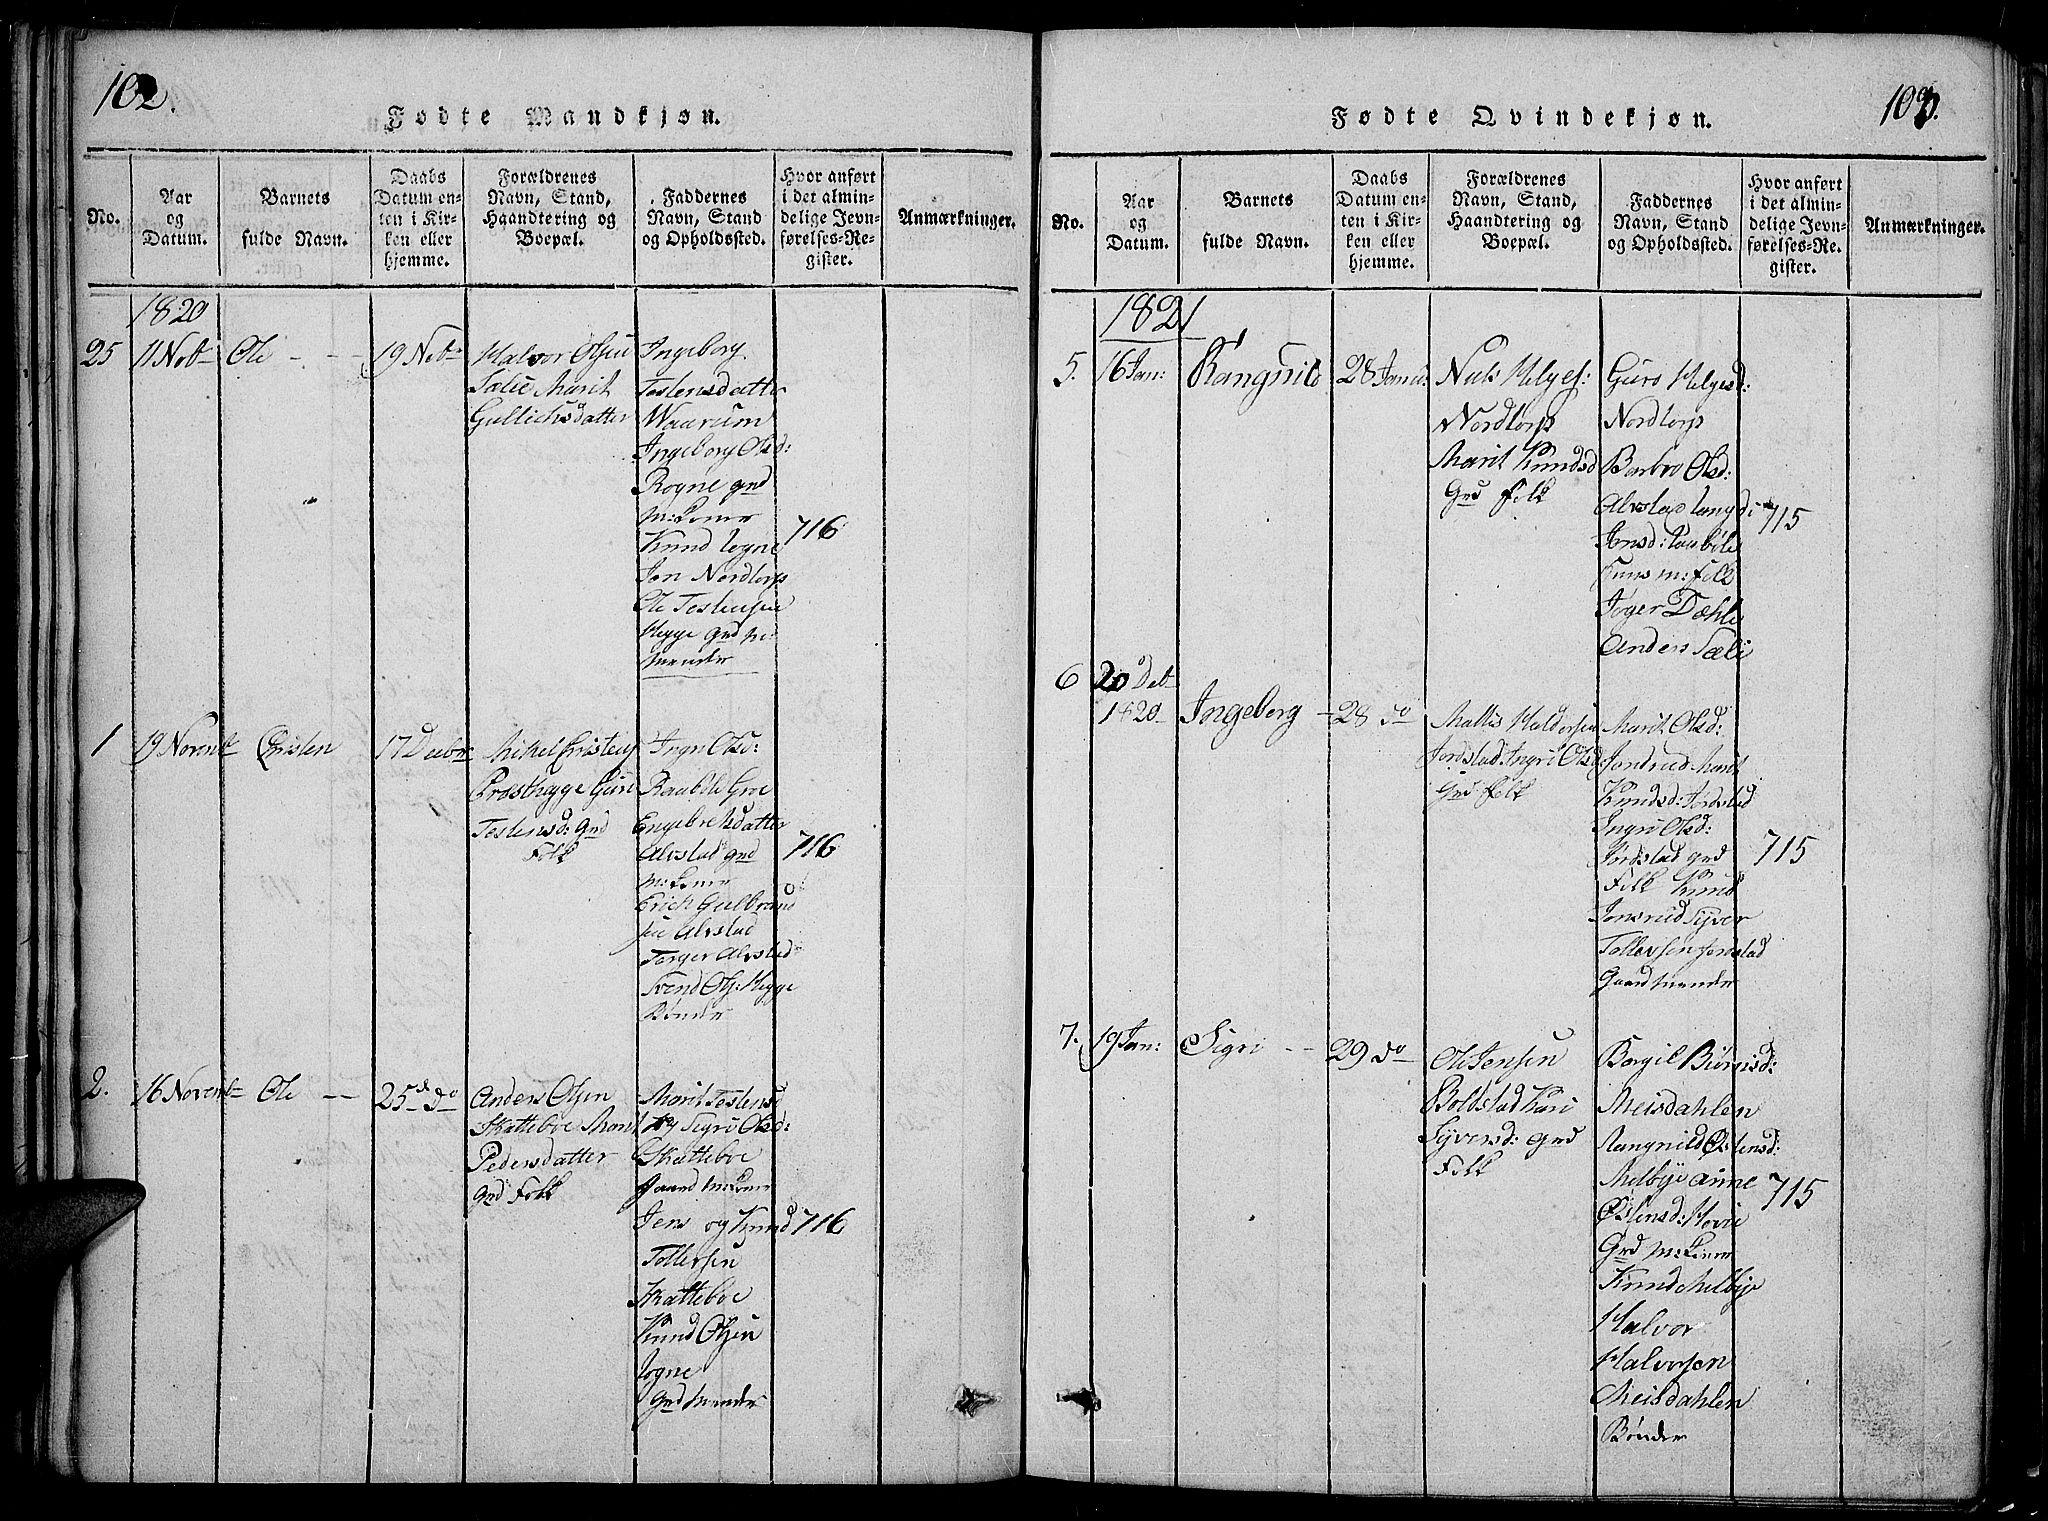 SAH, Slidre prestekontor, Klokkerbok nr. 2, 1814-1839, s. 102-103